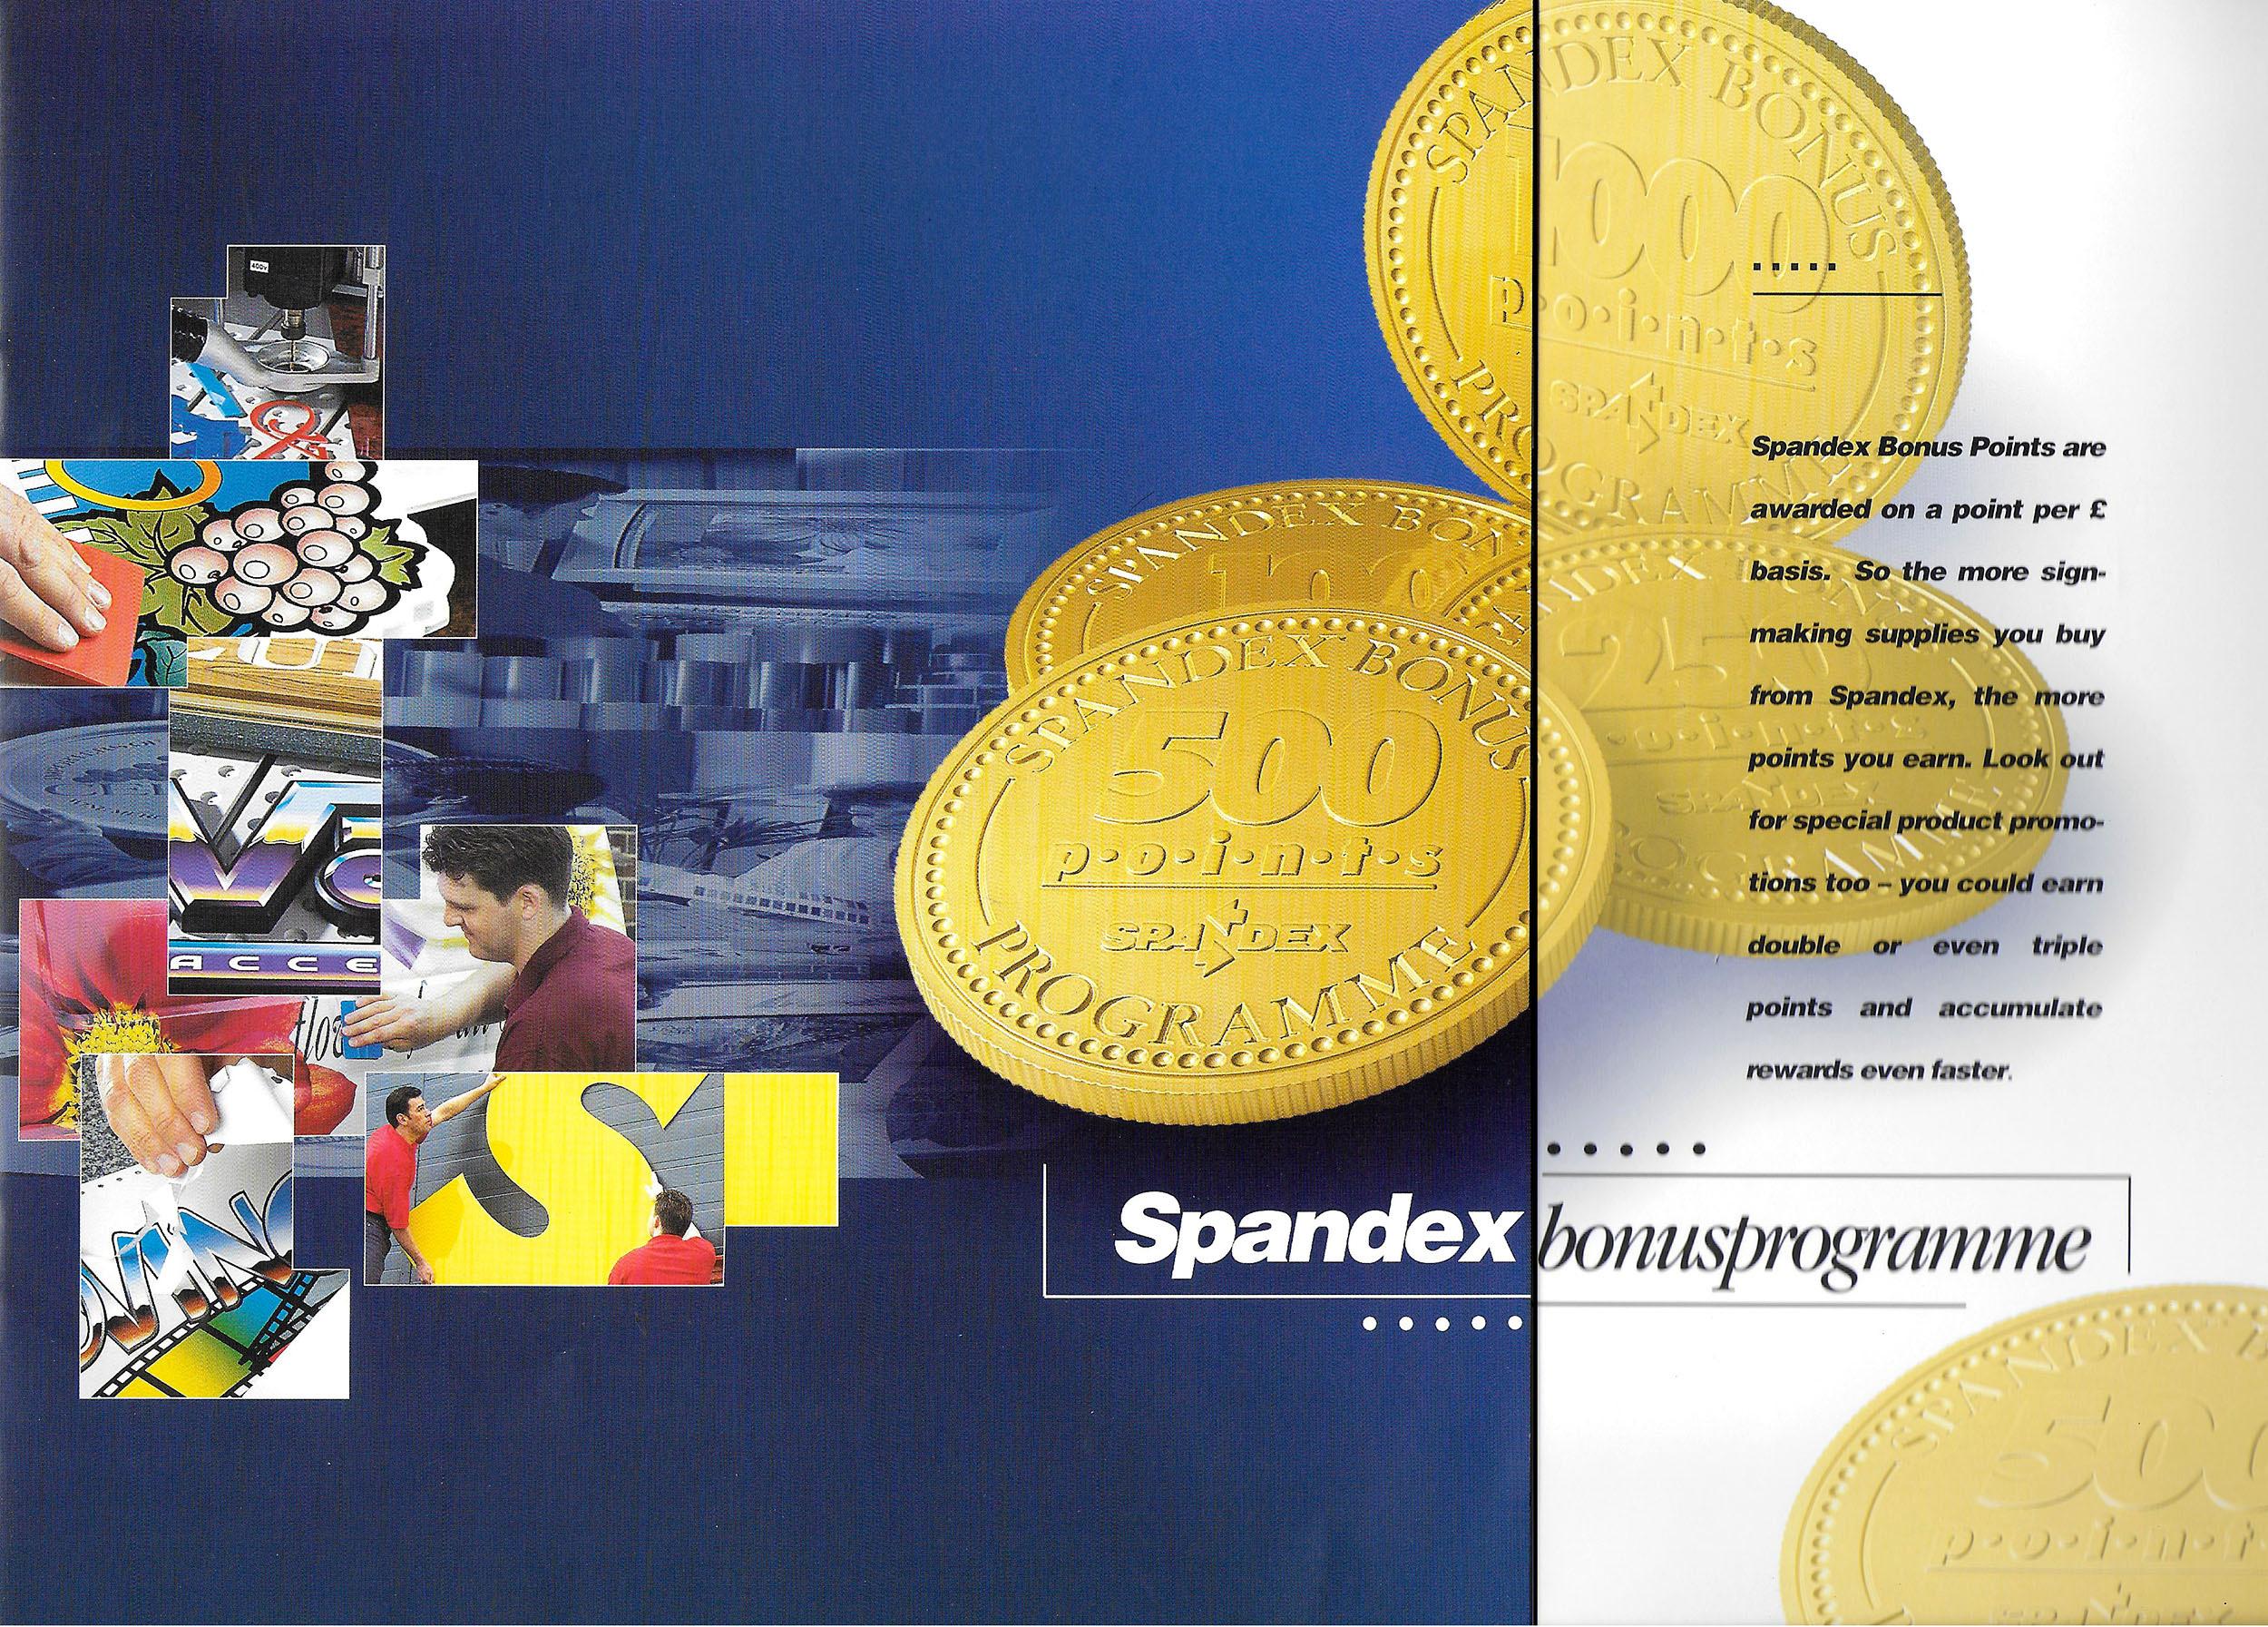 1993: Spandex introduce The Spandex Bonus loyalty programme